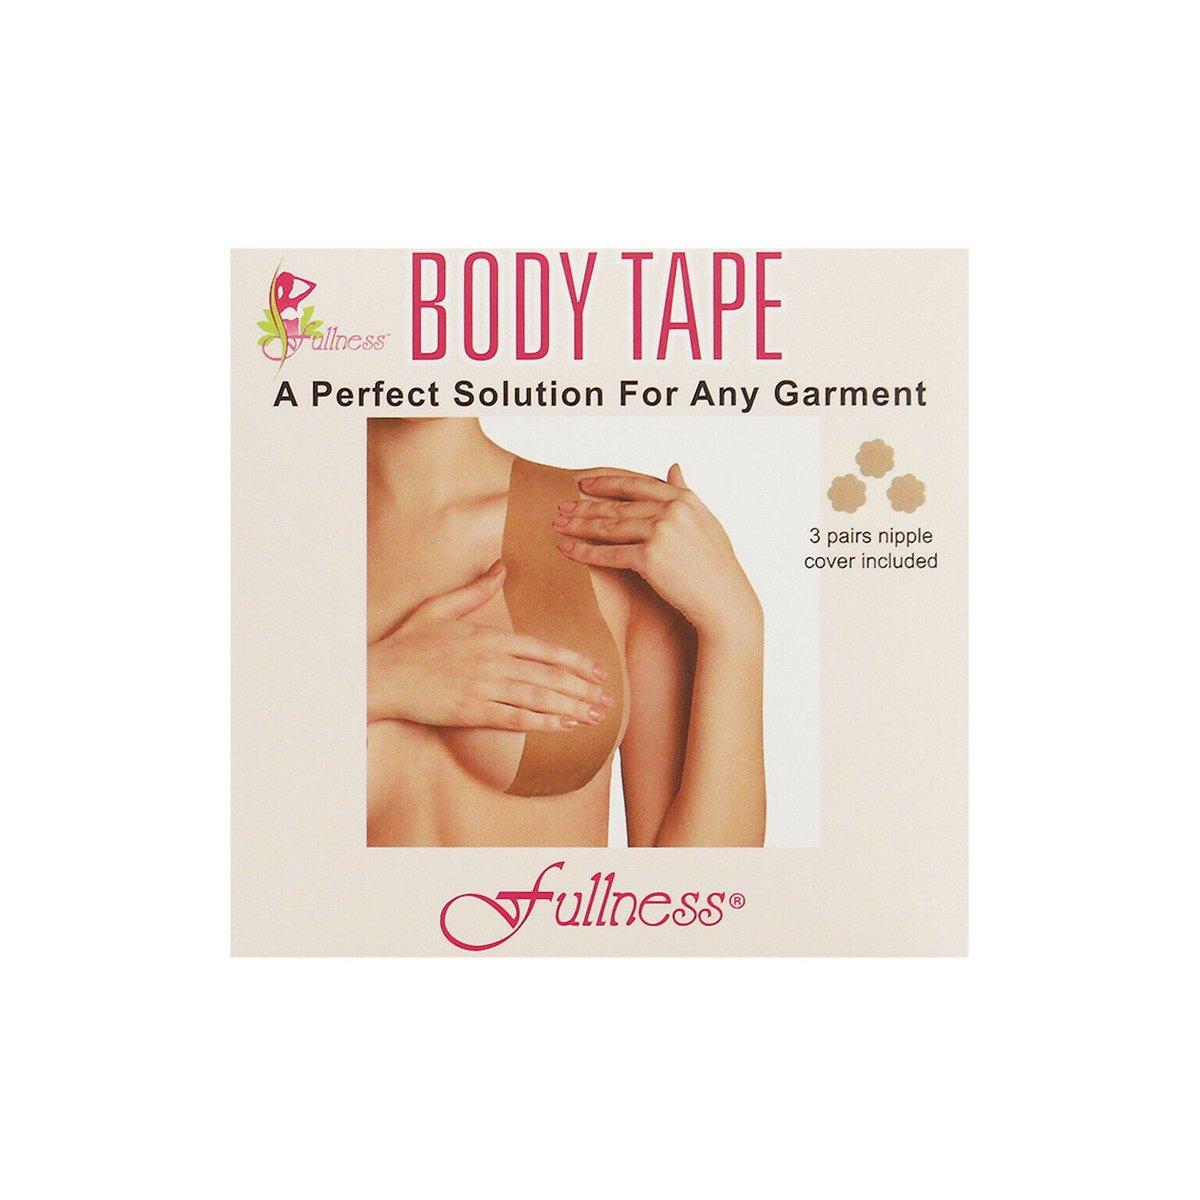 Image of Boob Tape